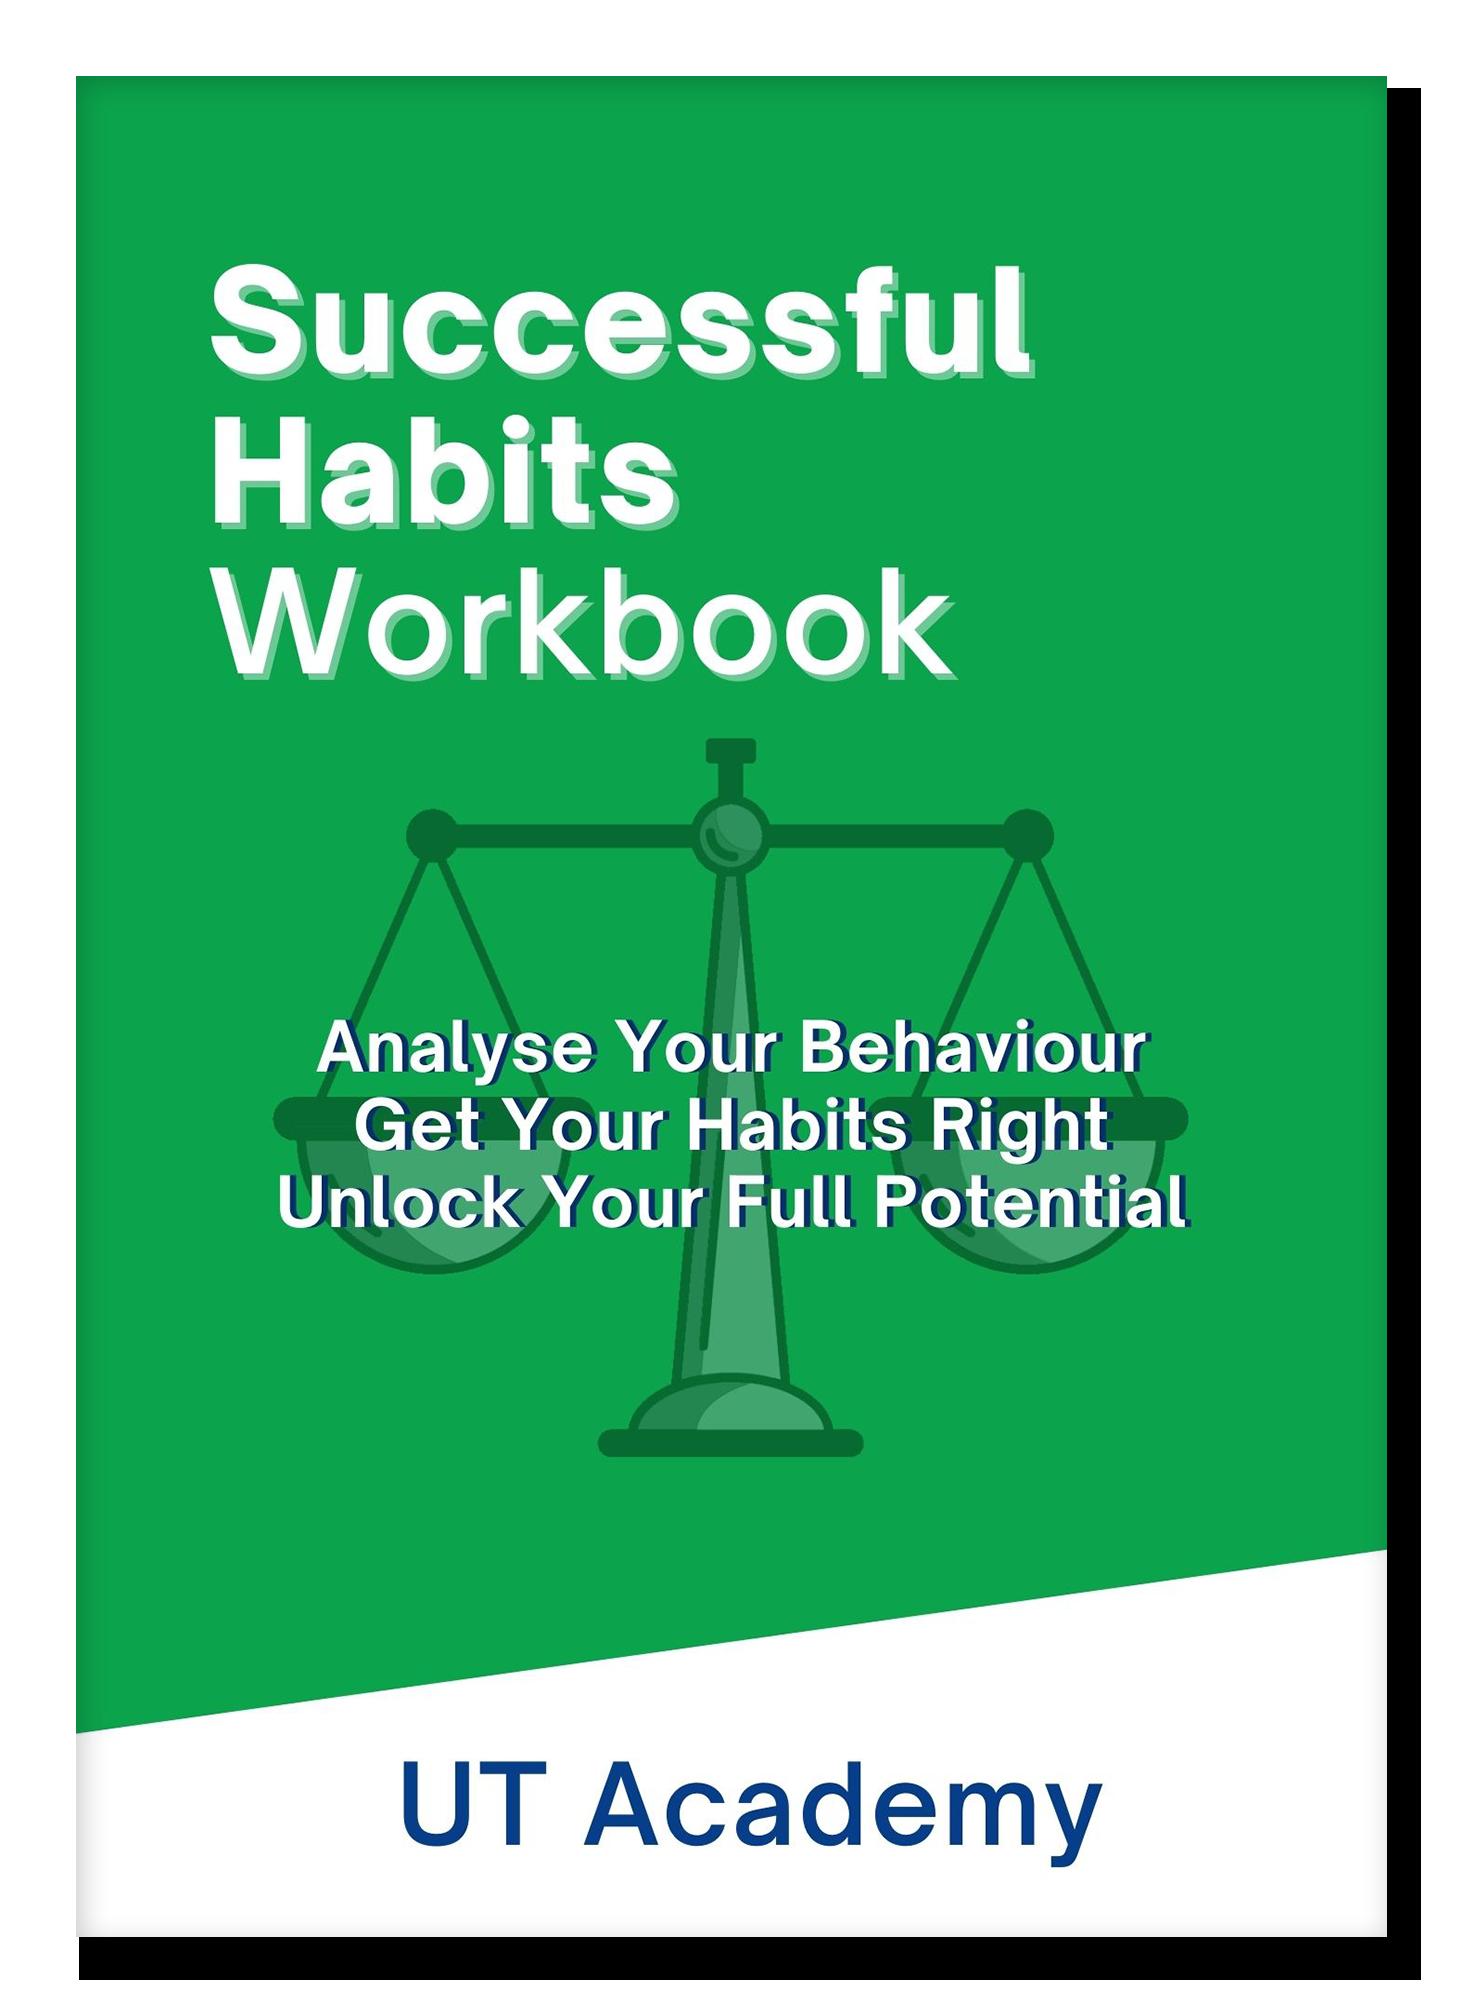 Habits-Workbook